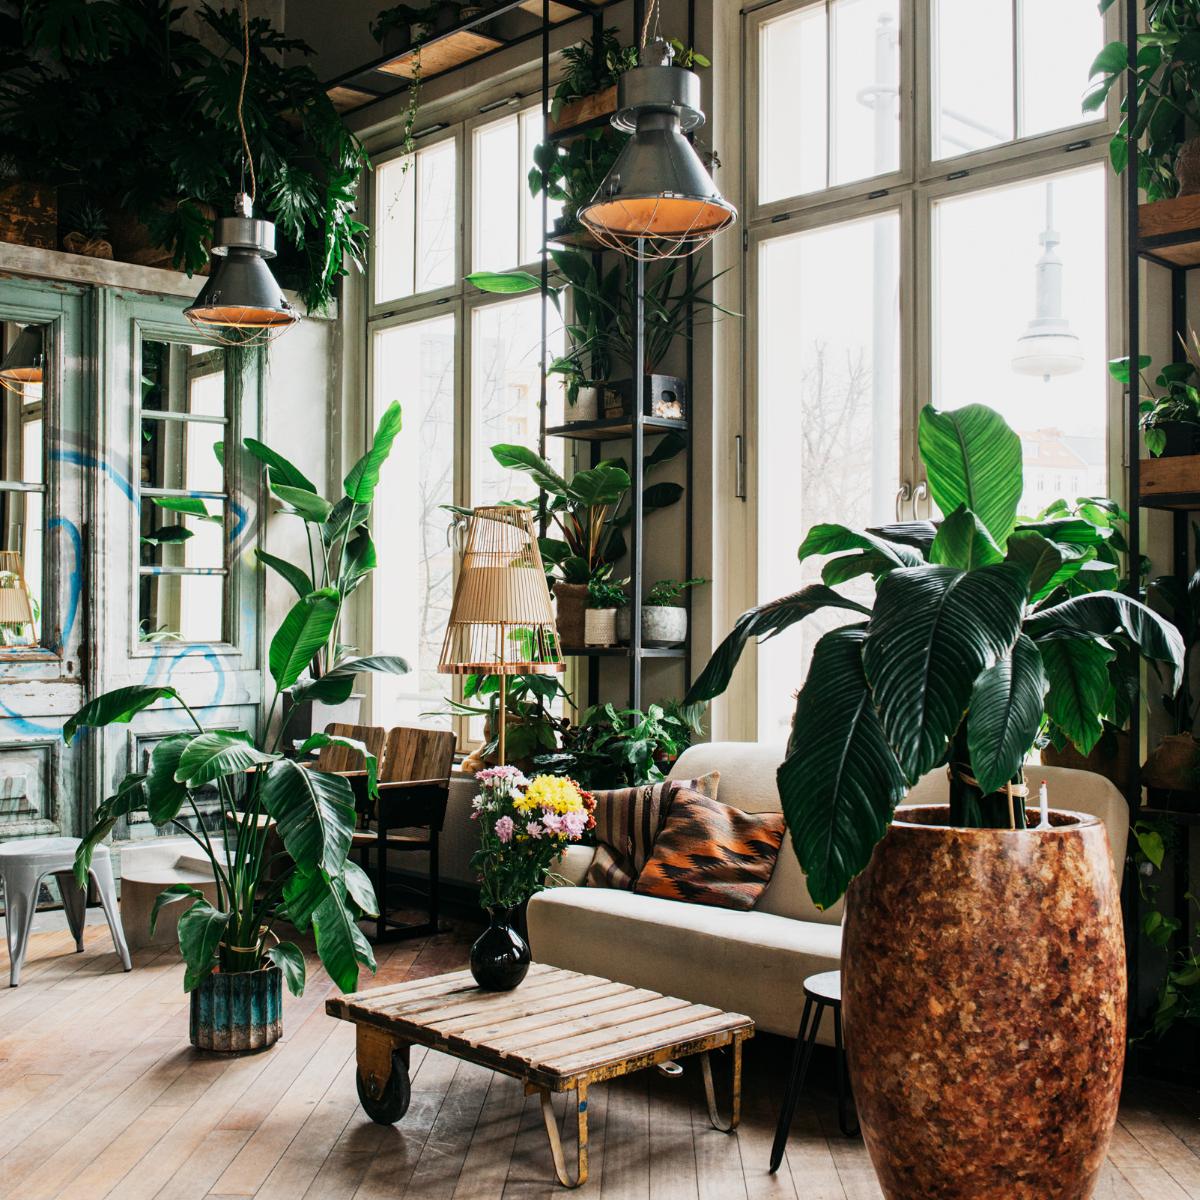 Frank Cafe Berlin cozy